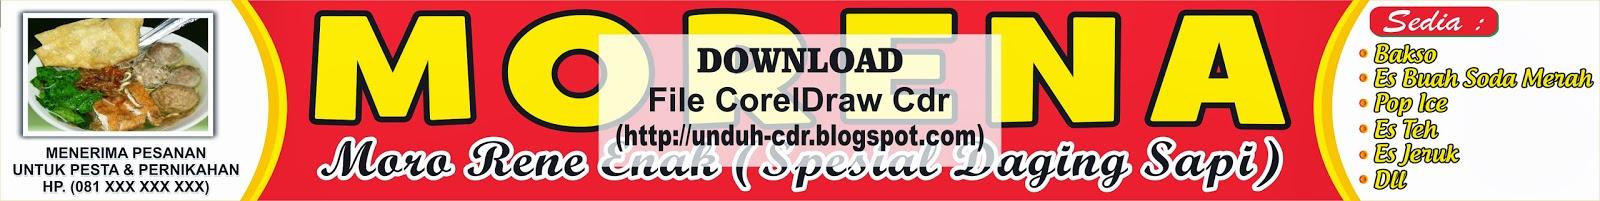 Design Banner Warung Bakso Morena File Cdr   Omah Corel